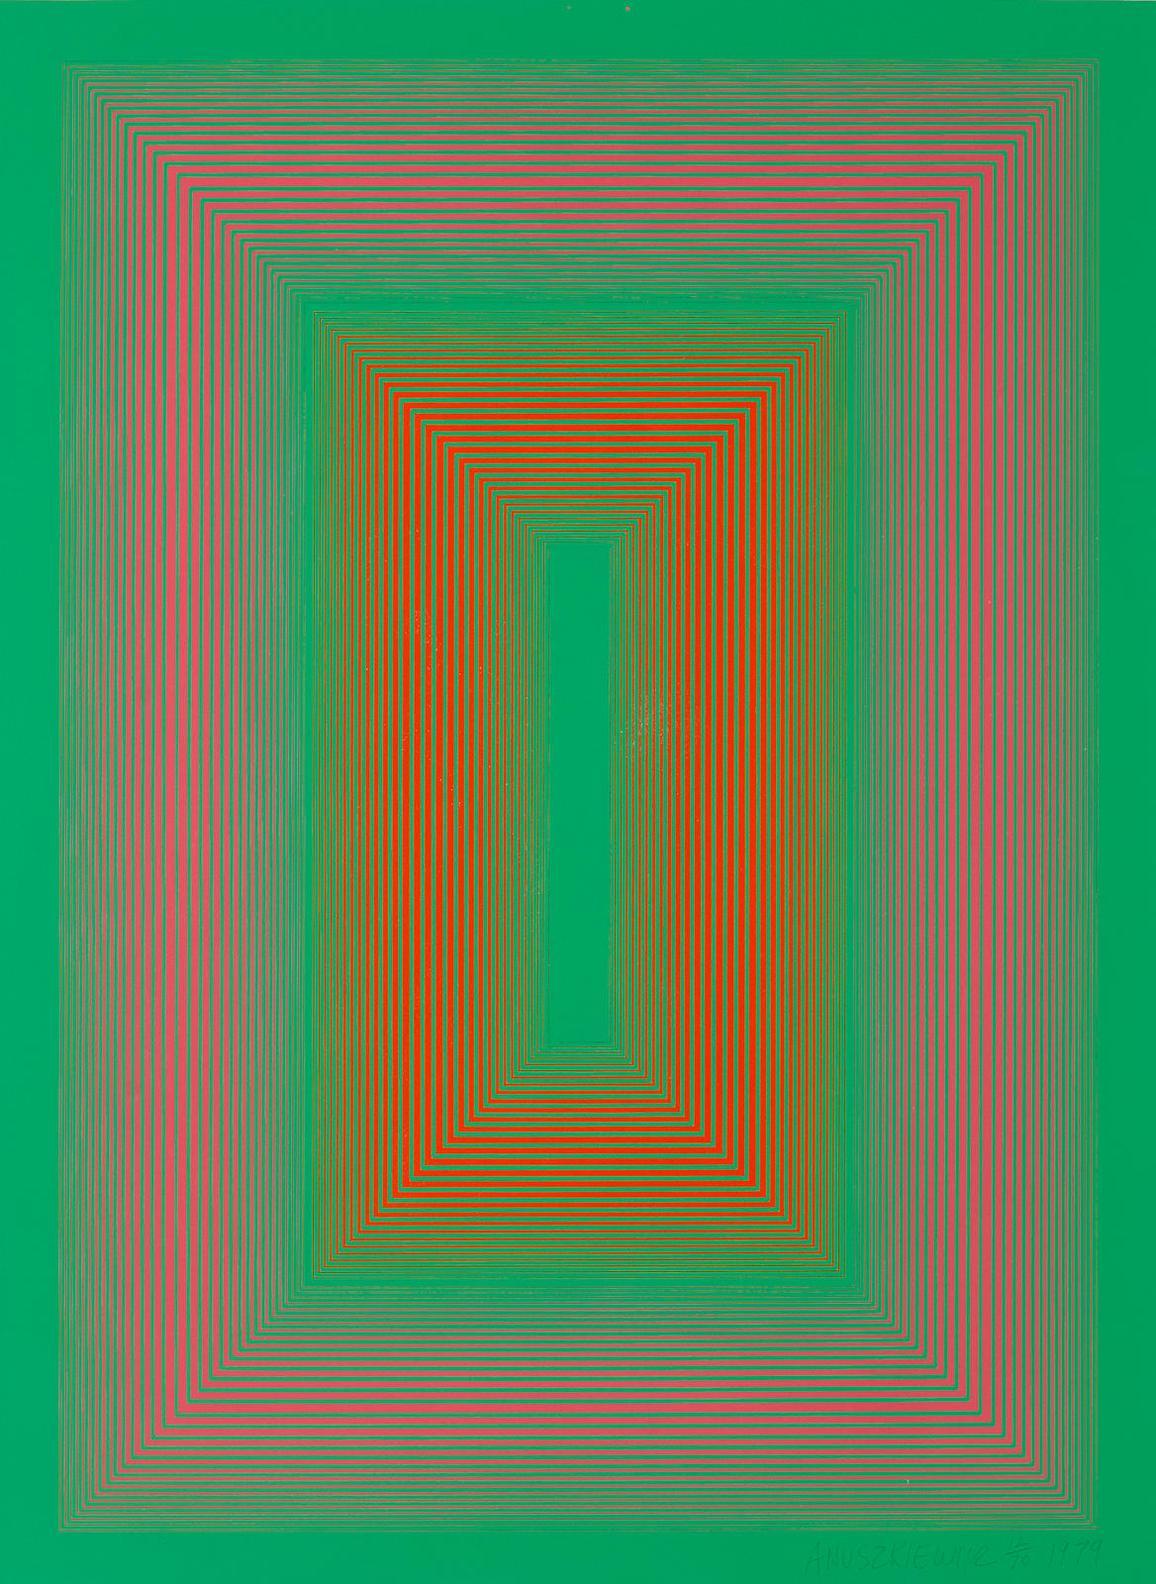 Richard Anuszkiewicz-Reflections Ii - Green Line-1979